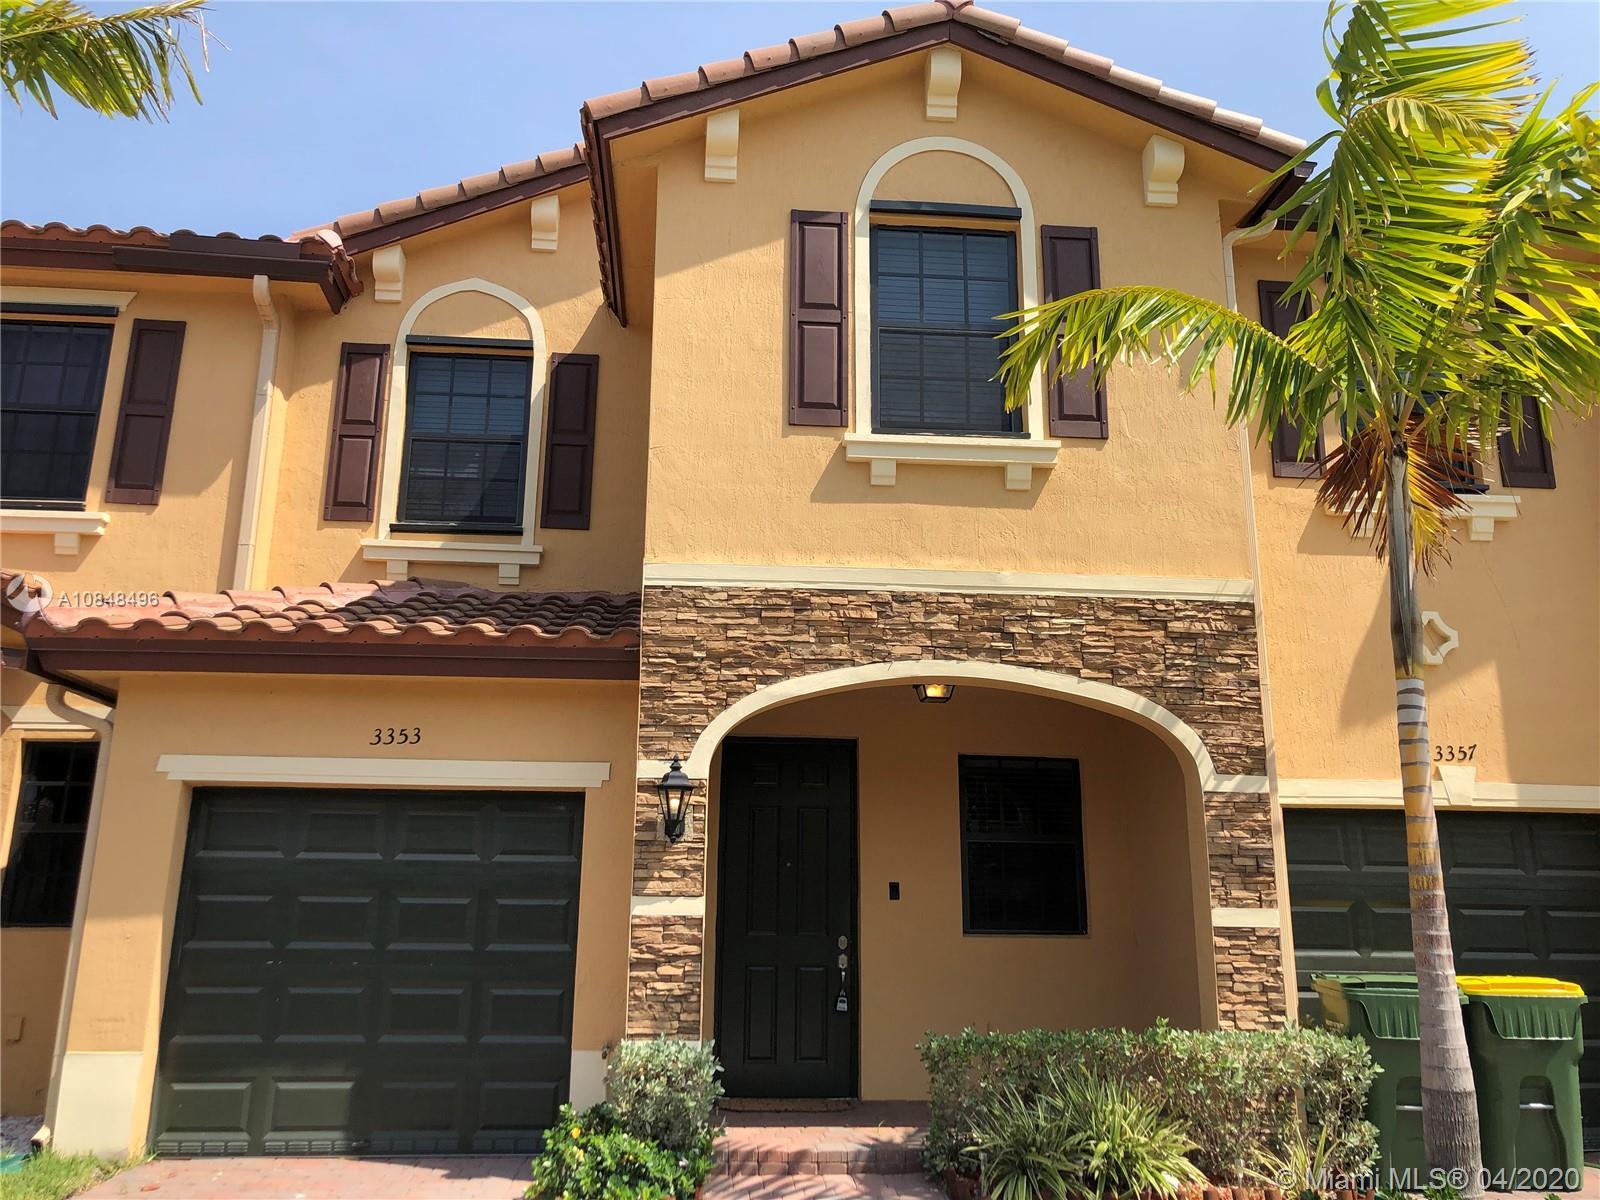 3353 SE 2nd Ct #3353, Homestead, FL 33033 - Homestead, FL real estate listing